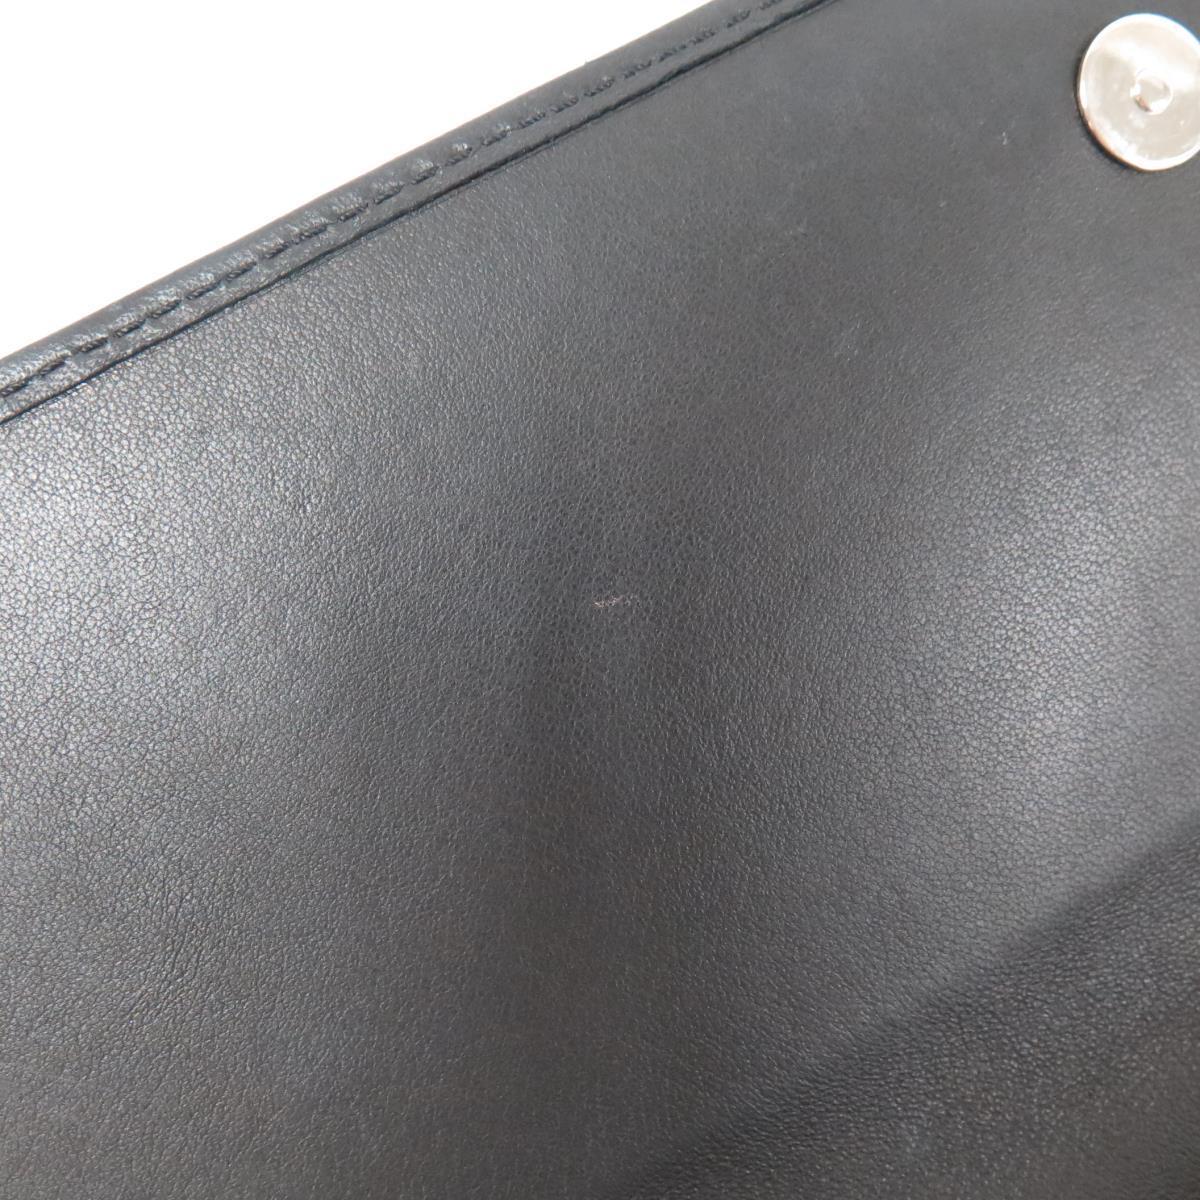 e4693af9b18f ブランド/メーカー:ジミーチュウ商品名:ジミーチュウ バッグ通称:(クラッチバッグ) 商品ランク:中古品A 素材:レザーサイズ:横×縦×マチ(幅)  : 28cm × 17cm × 3cm